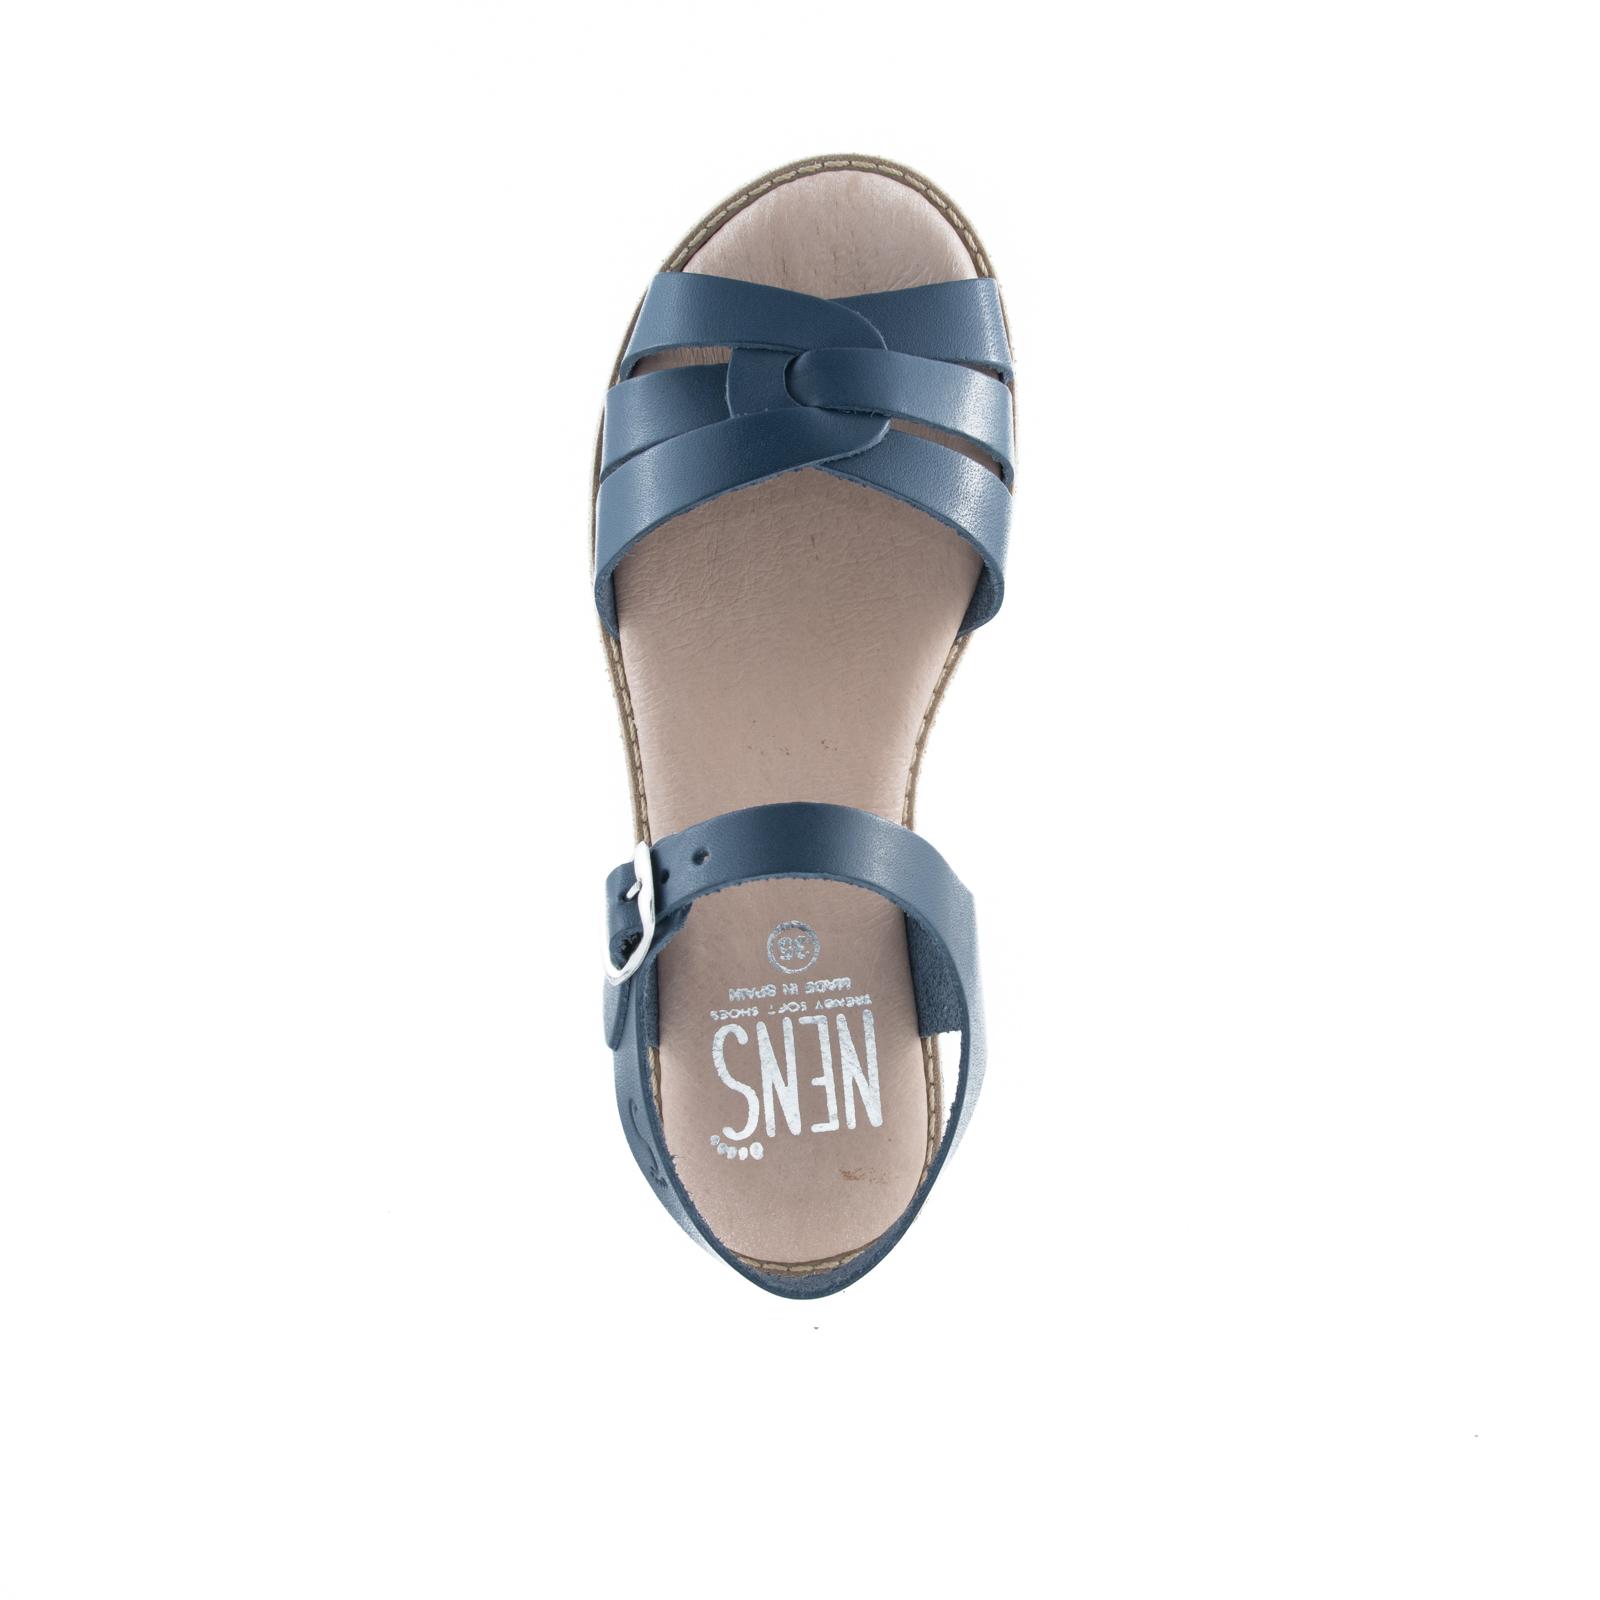 NENS Sandals Navy 5760–M. Before £36.50